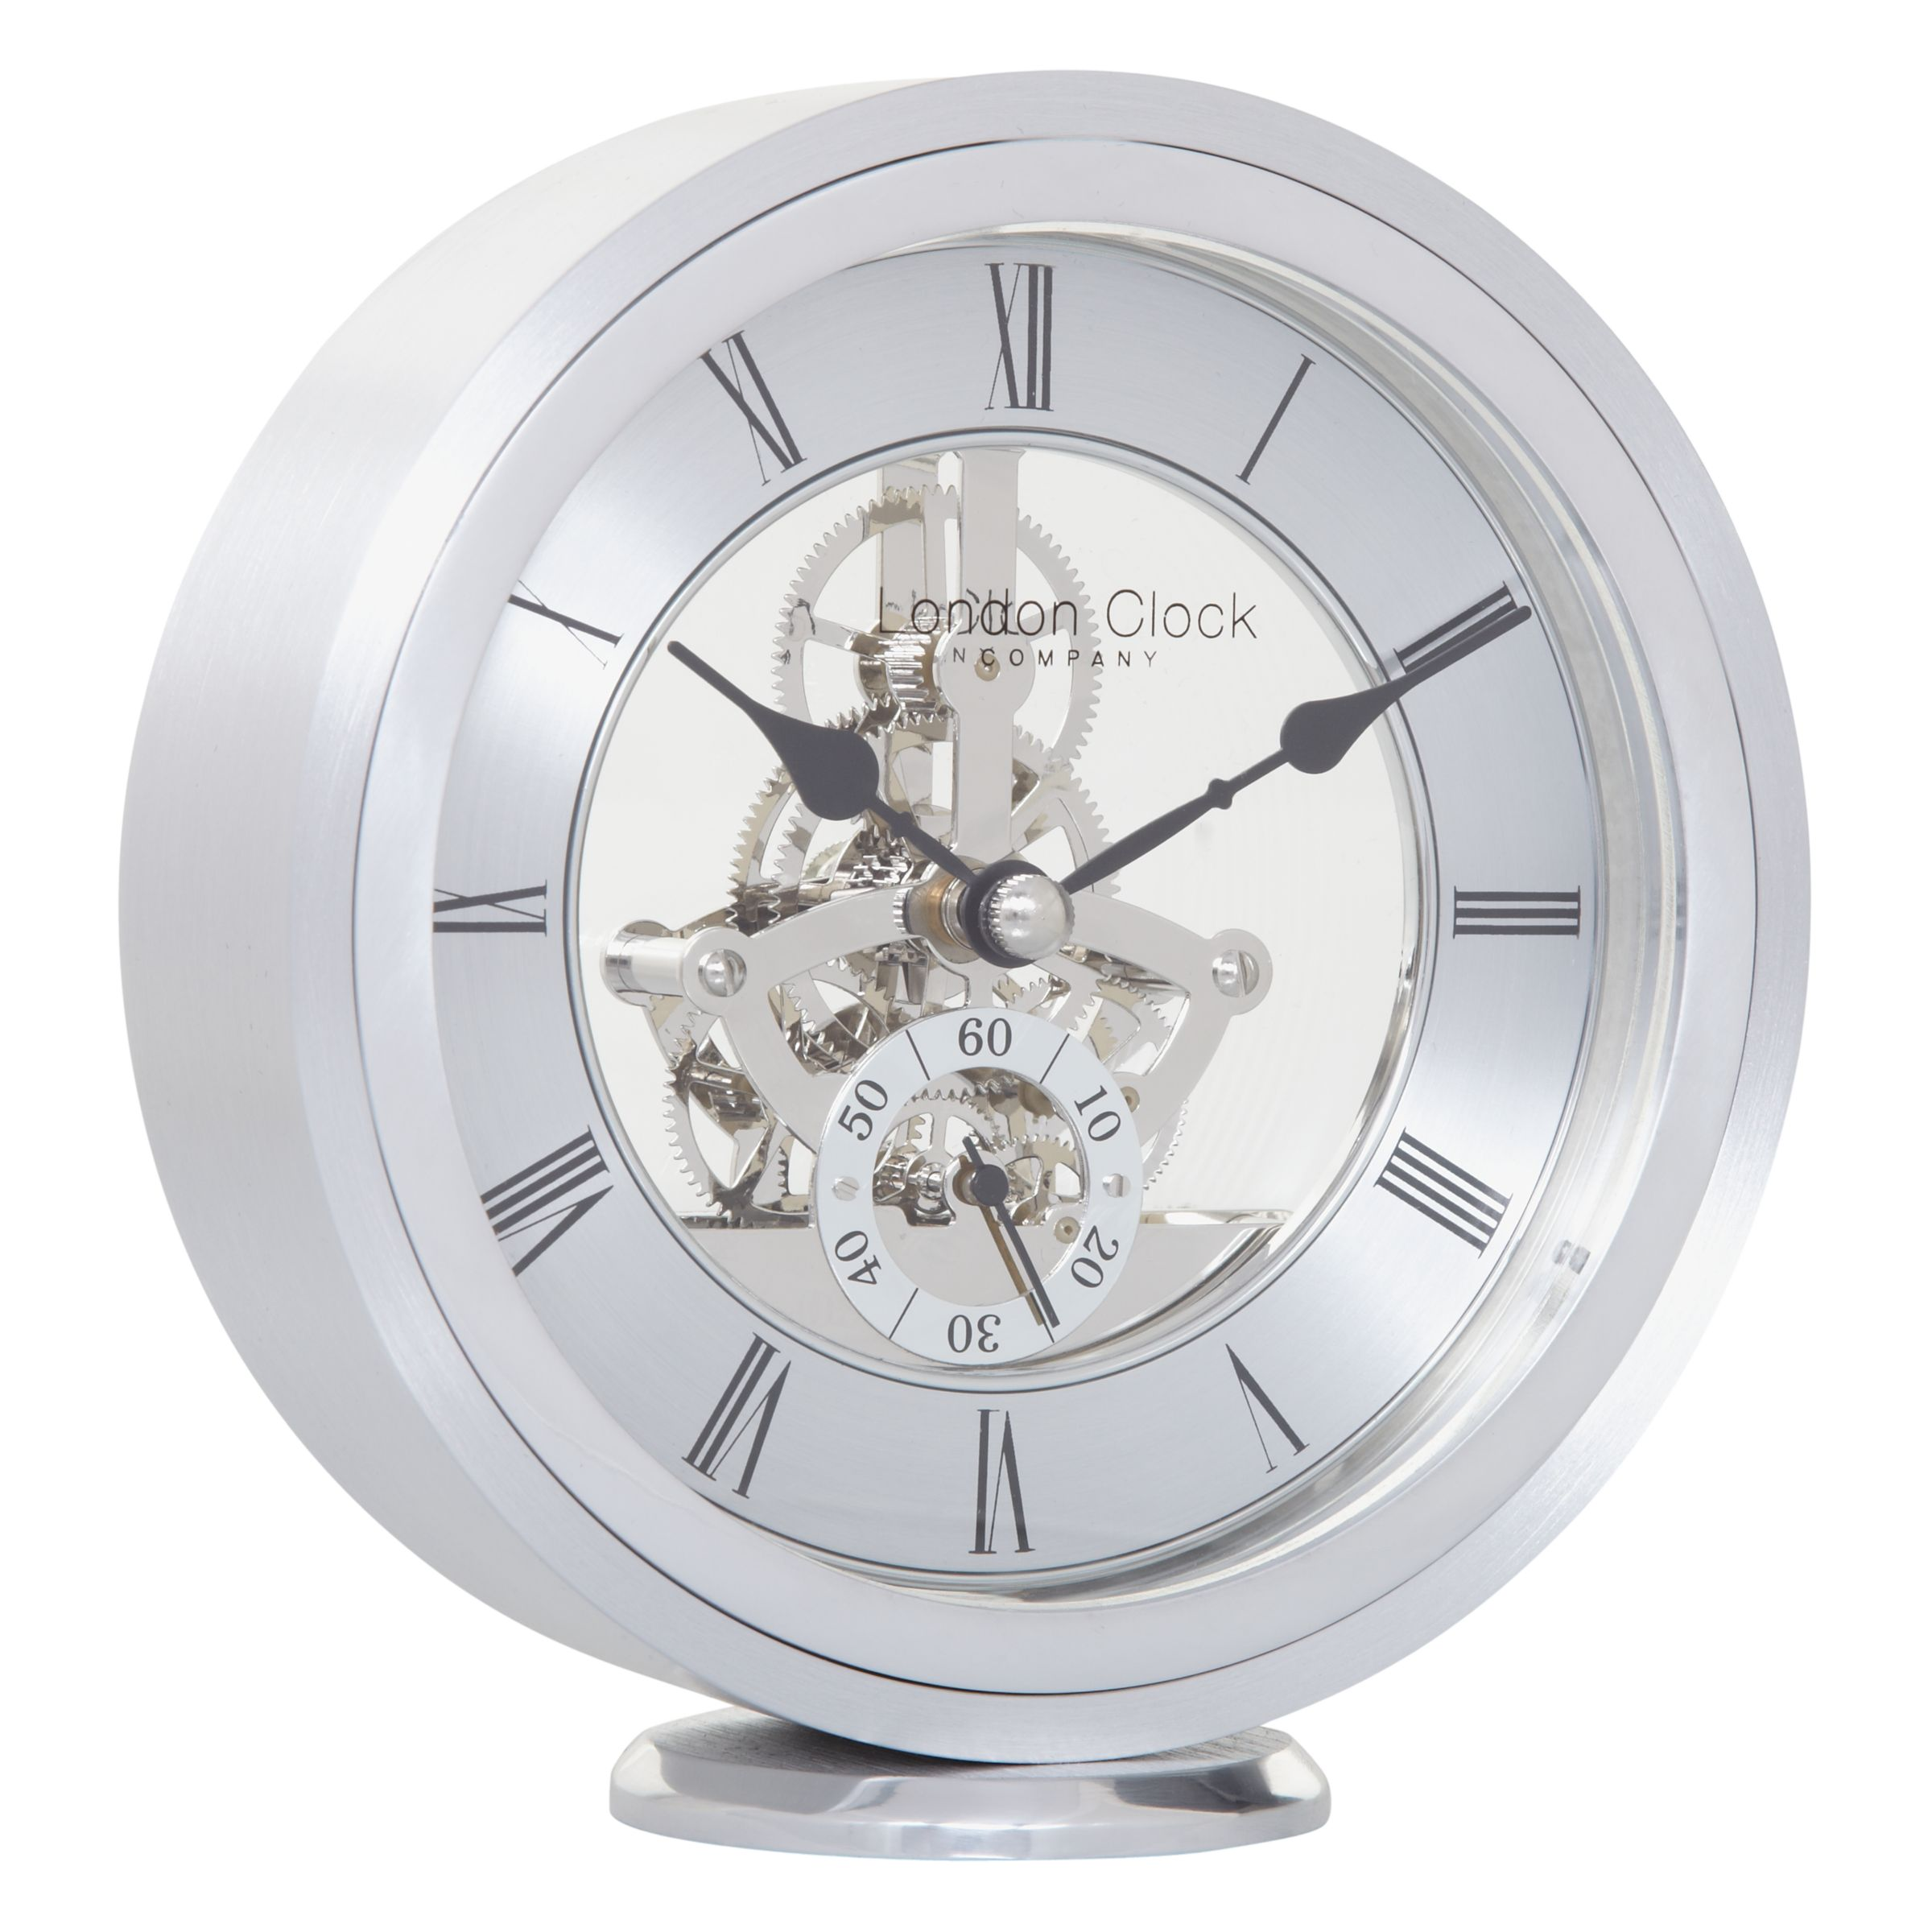 London Clock Company London Clock Company Round Carriage Clock